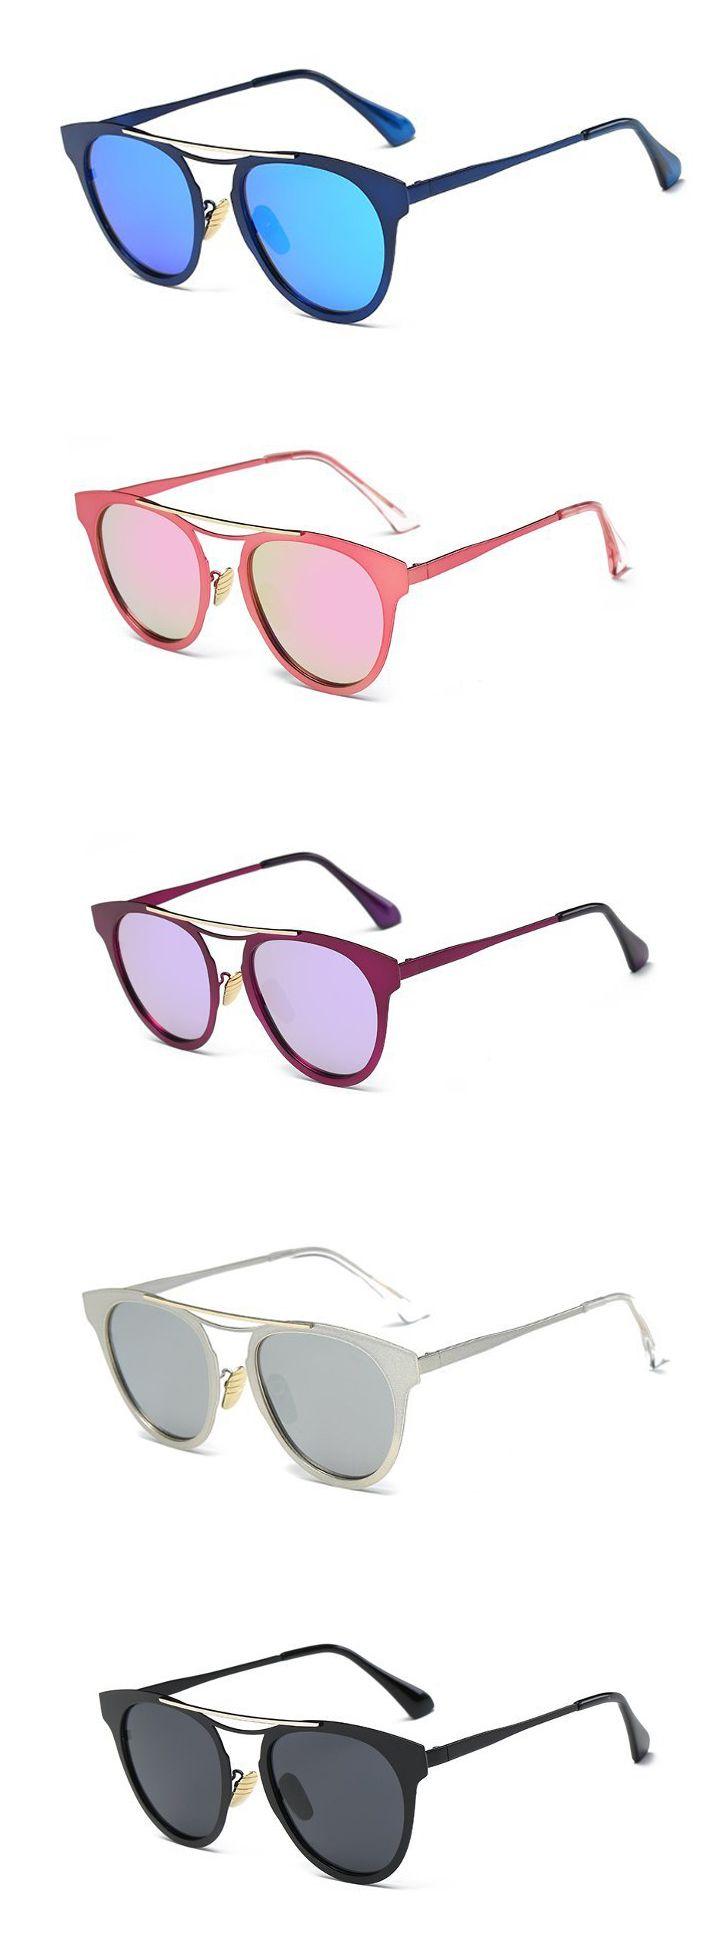 Fashion Women Polarized Glasses Light Irregular Cat Eye Colorful Sunglasses